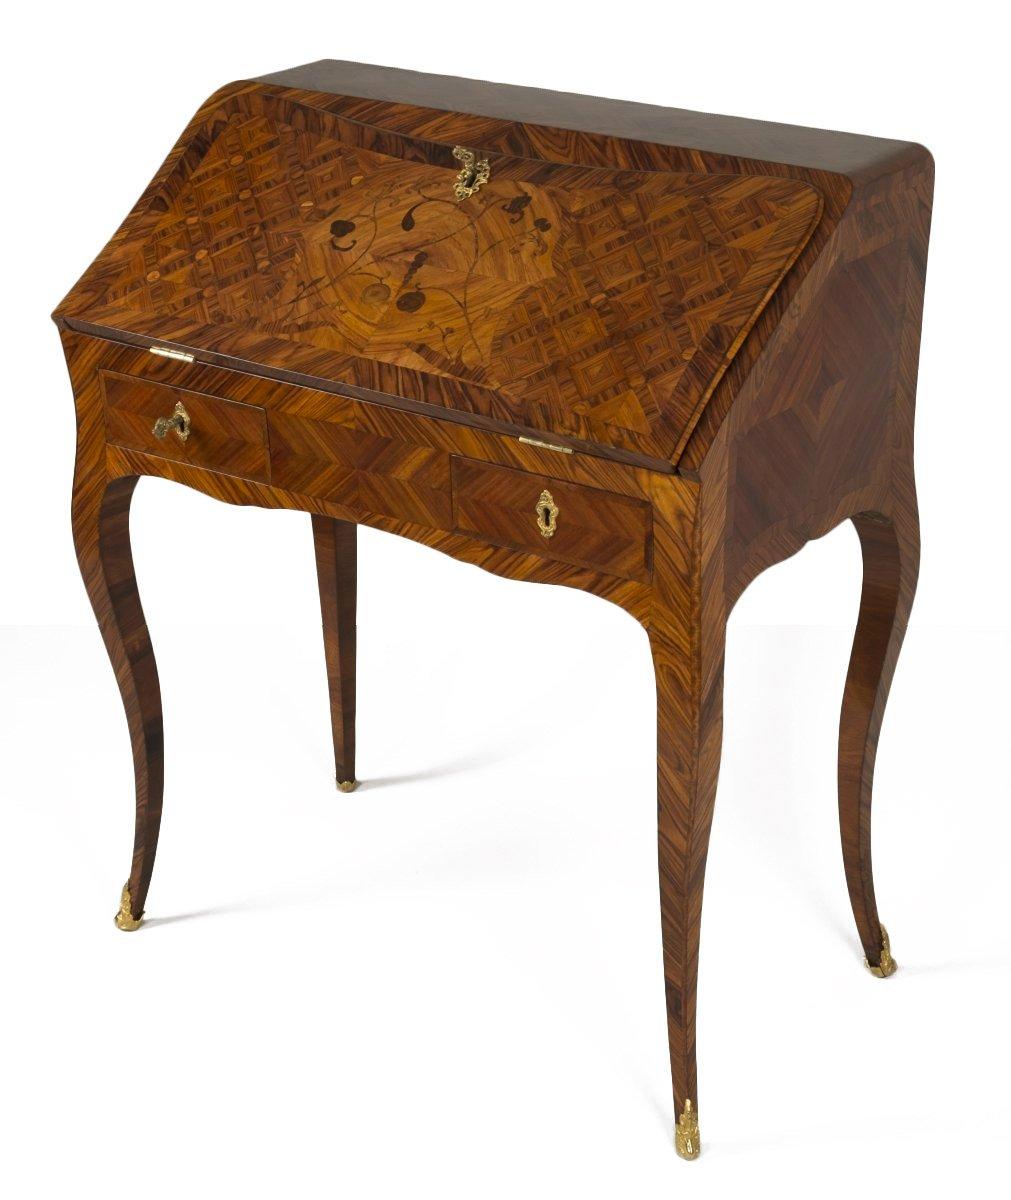 louis xv dos d 039 ane desk stamped i c saunier